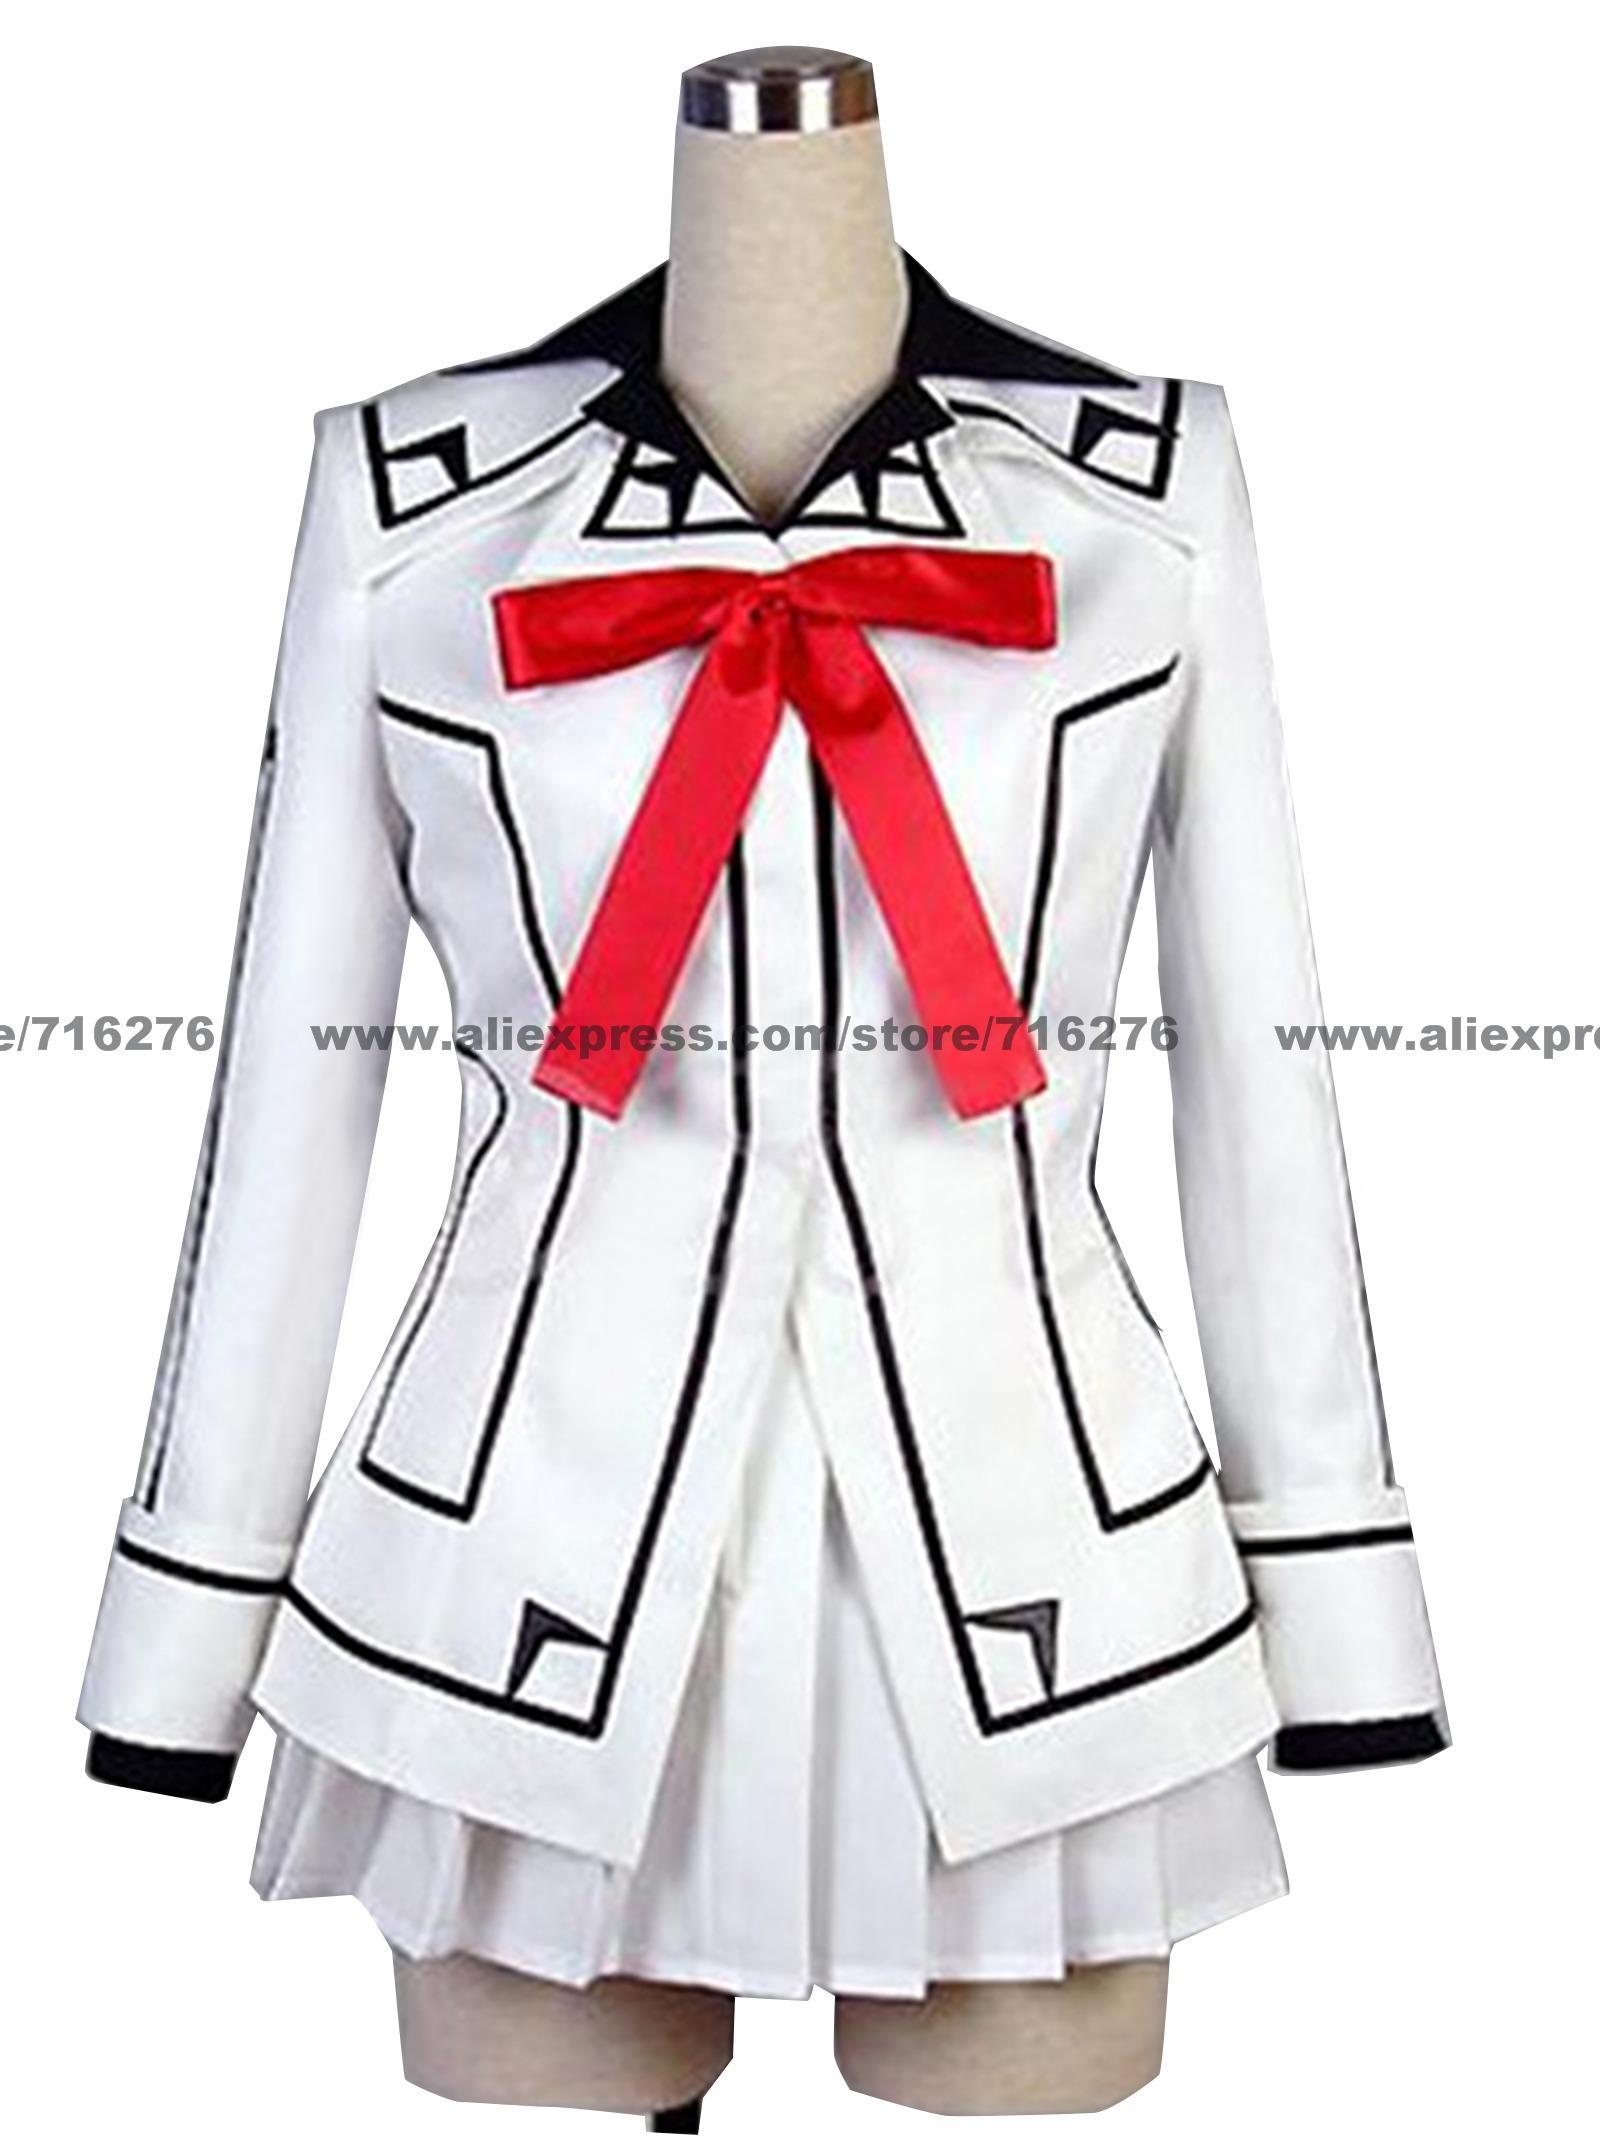 Anime Vampire chevalier Cosplay-Vampire chevalier Cosplay nuit classe fille Kurosu Yuuki uniforme femme Costume brassard inclus